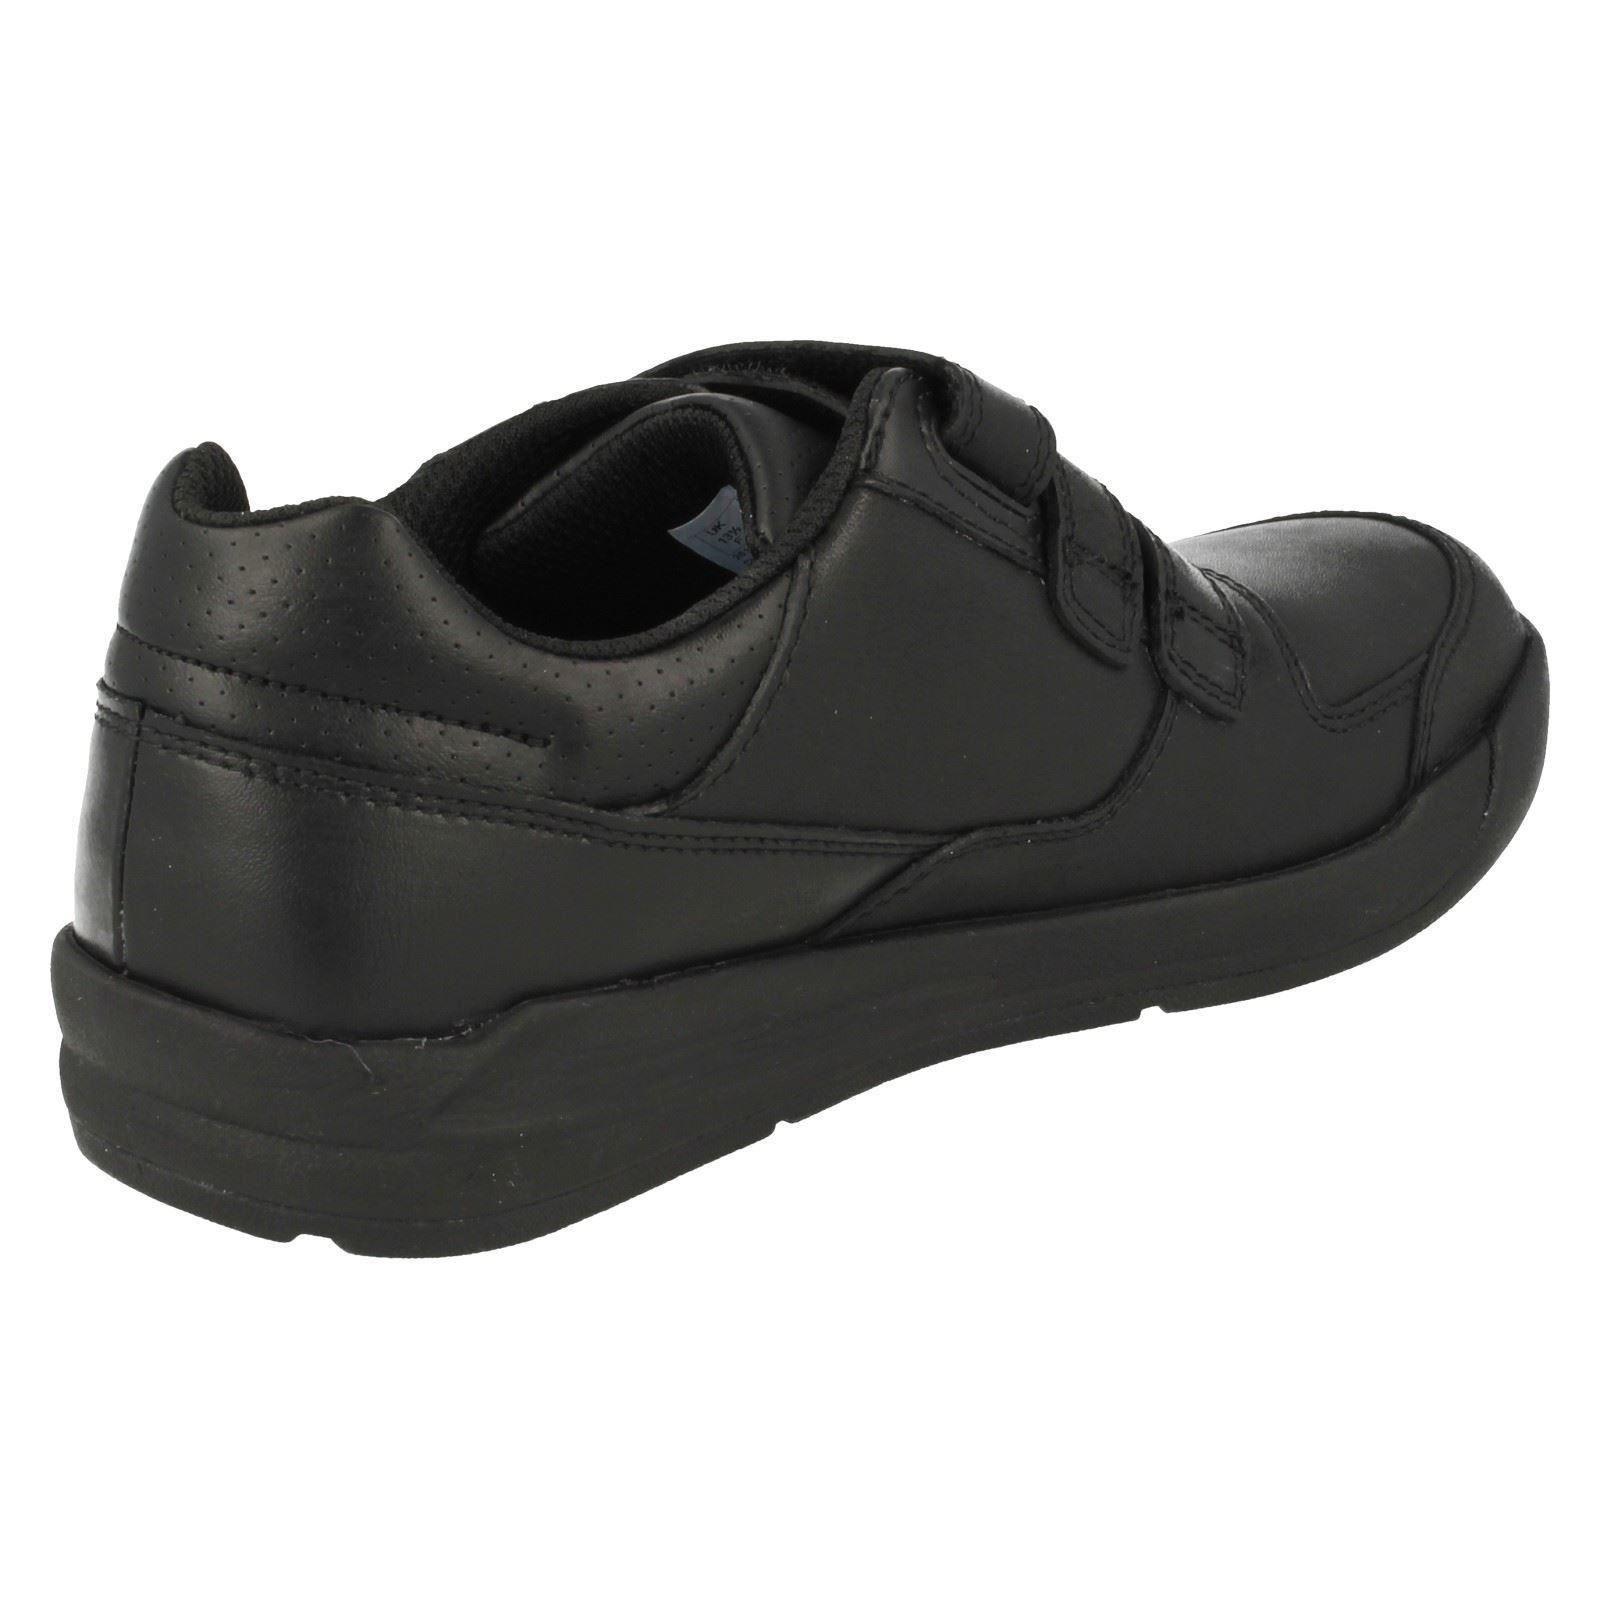 Garçons Clarks Flare Lite School Shoes